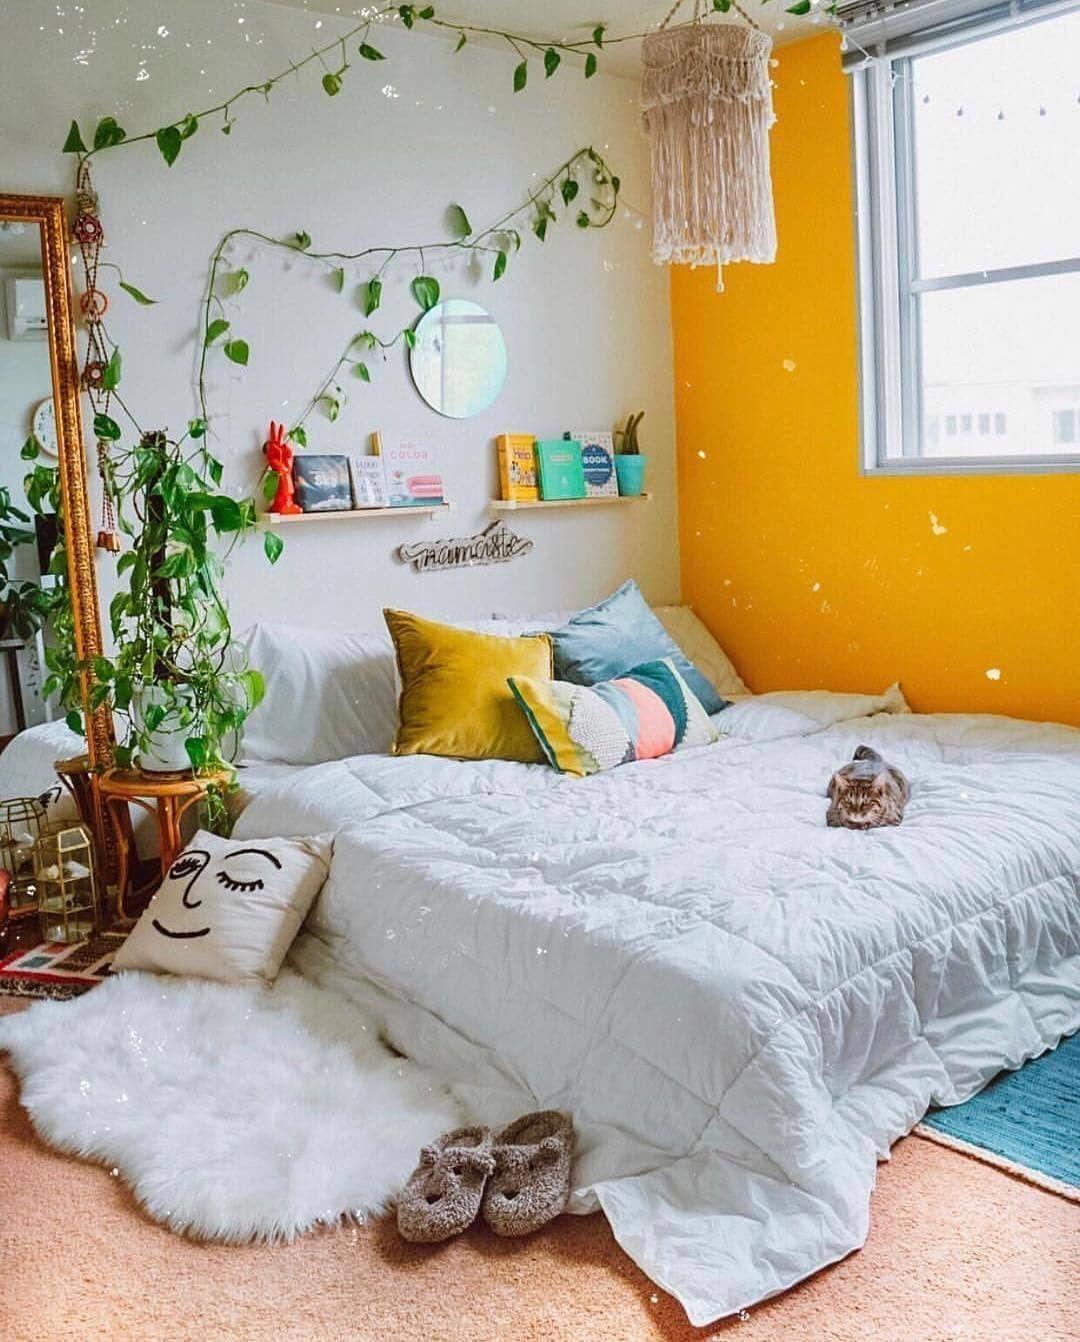 21 Best Ikea Storage Hacks For Small Bedrooms Ikea Small Spaces Small Bedroom Bed Small Bedroom Storage